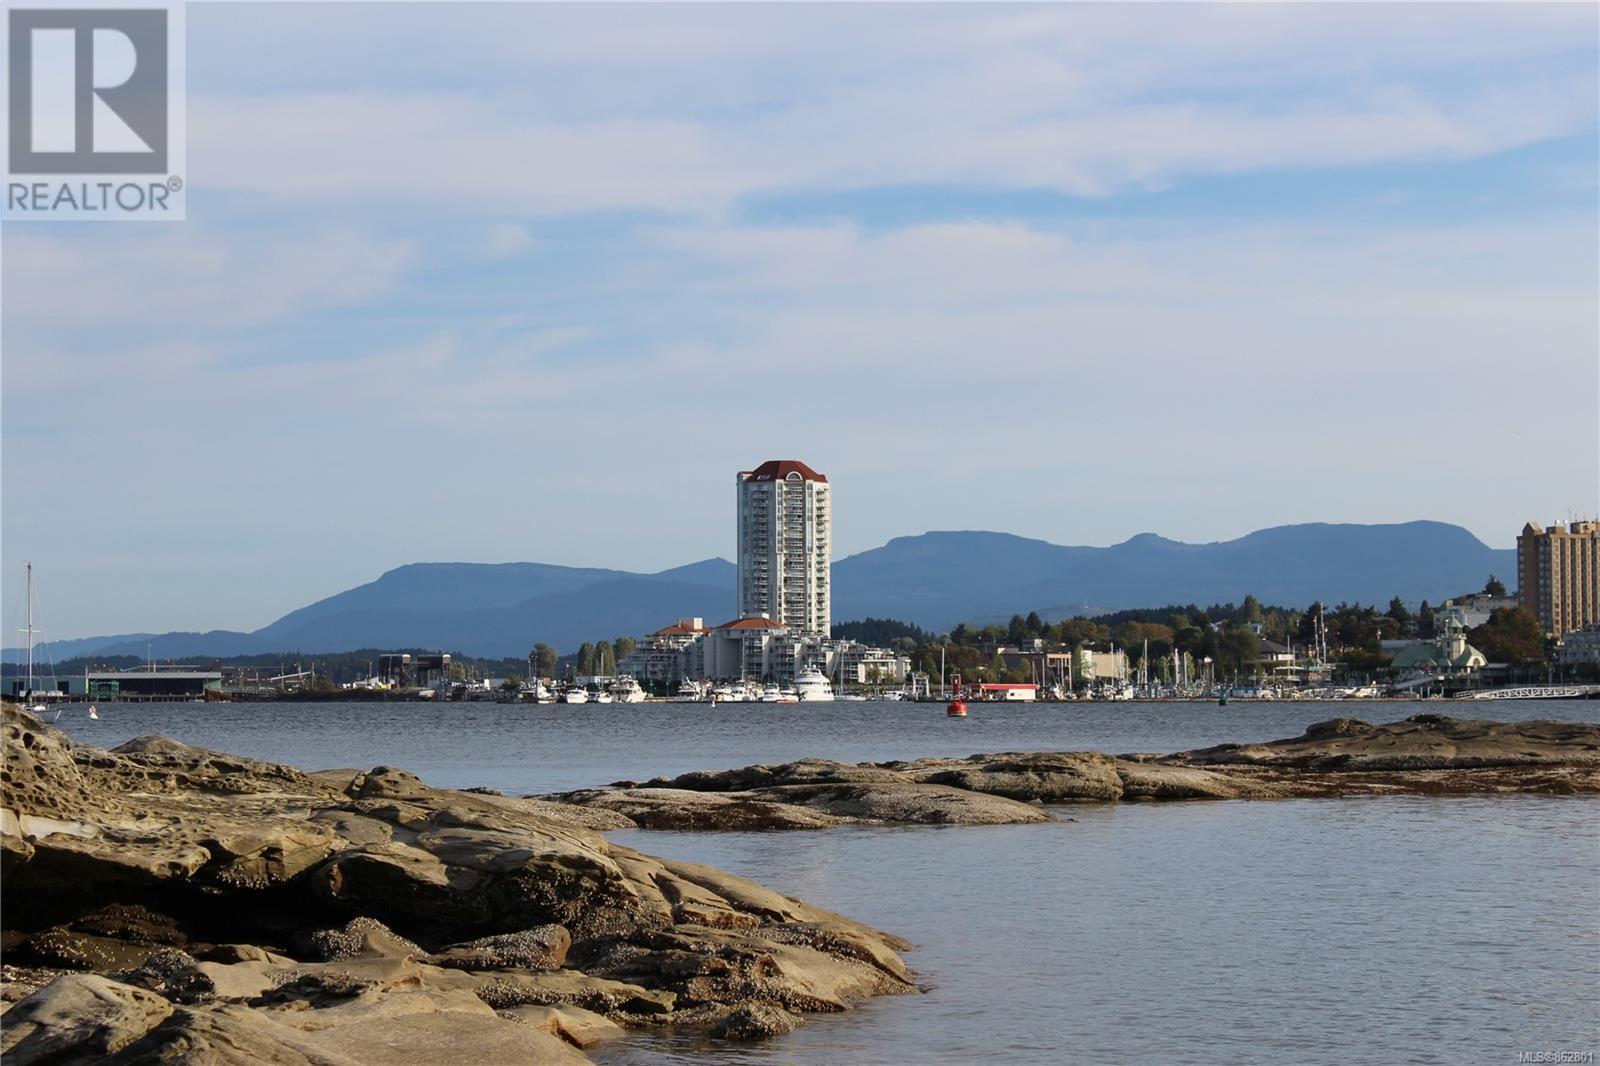 203 150 Promenade Dr, Nanaimo, British Columbia  V9R 6M6 - Photo 26 - 862801